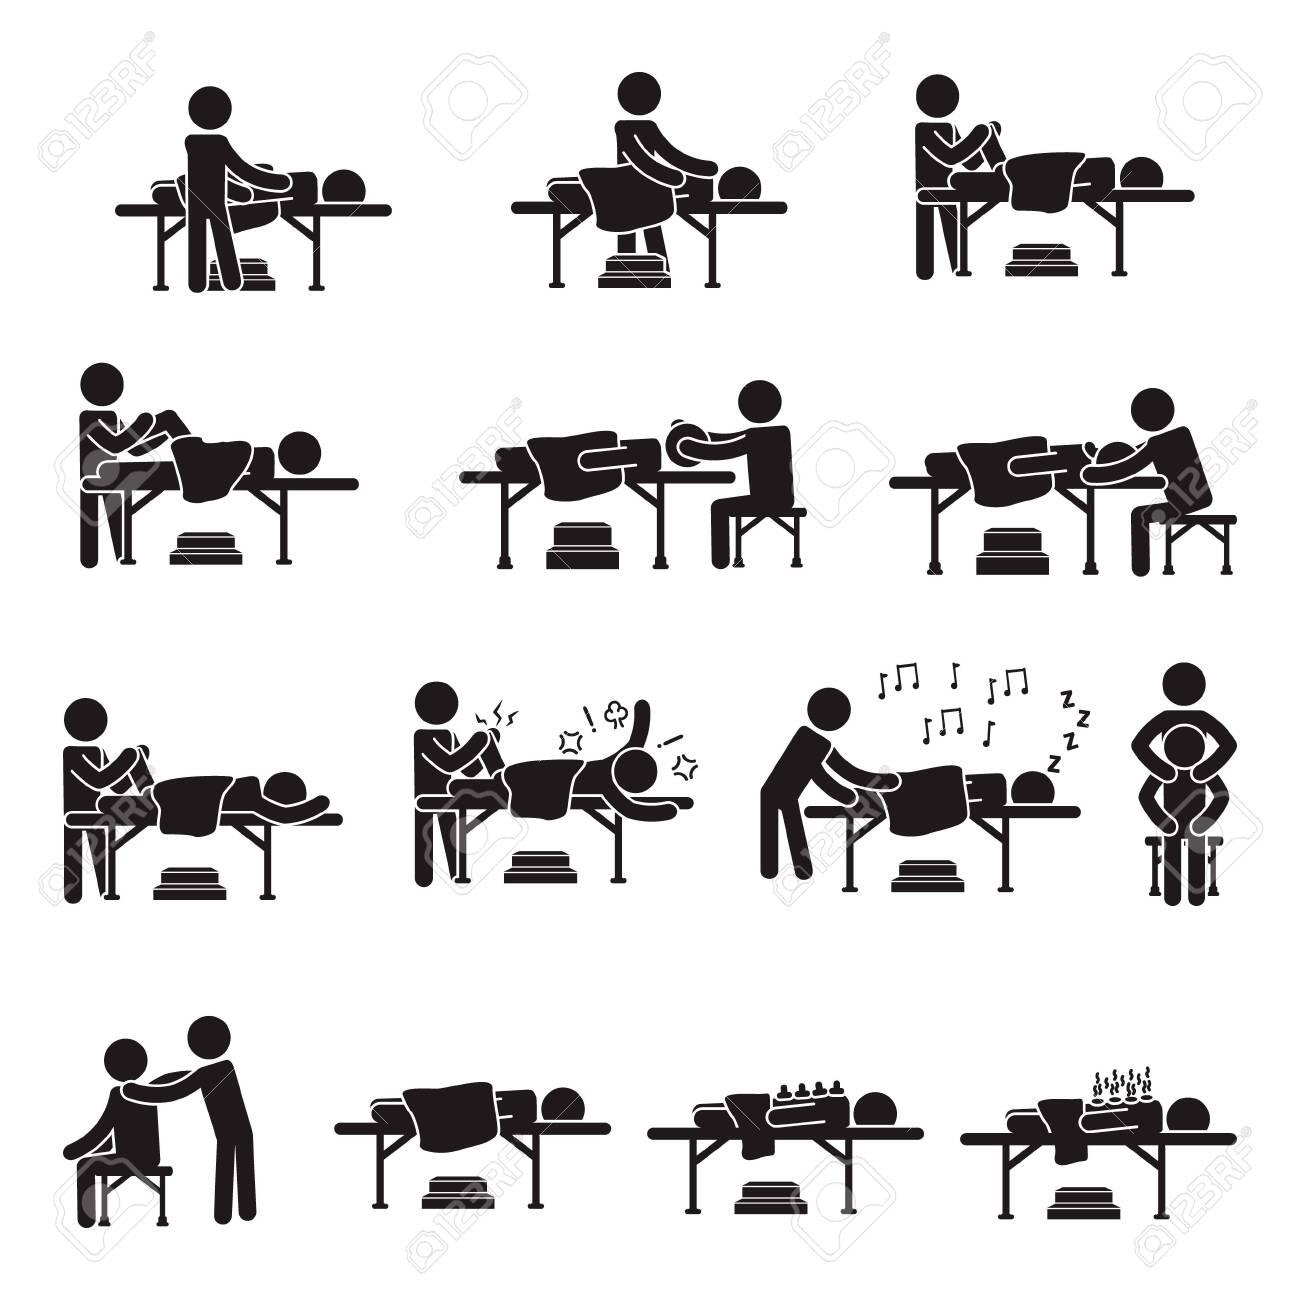 Massage people icon set. Vector. - 135535912